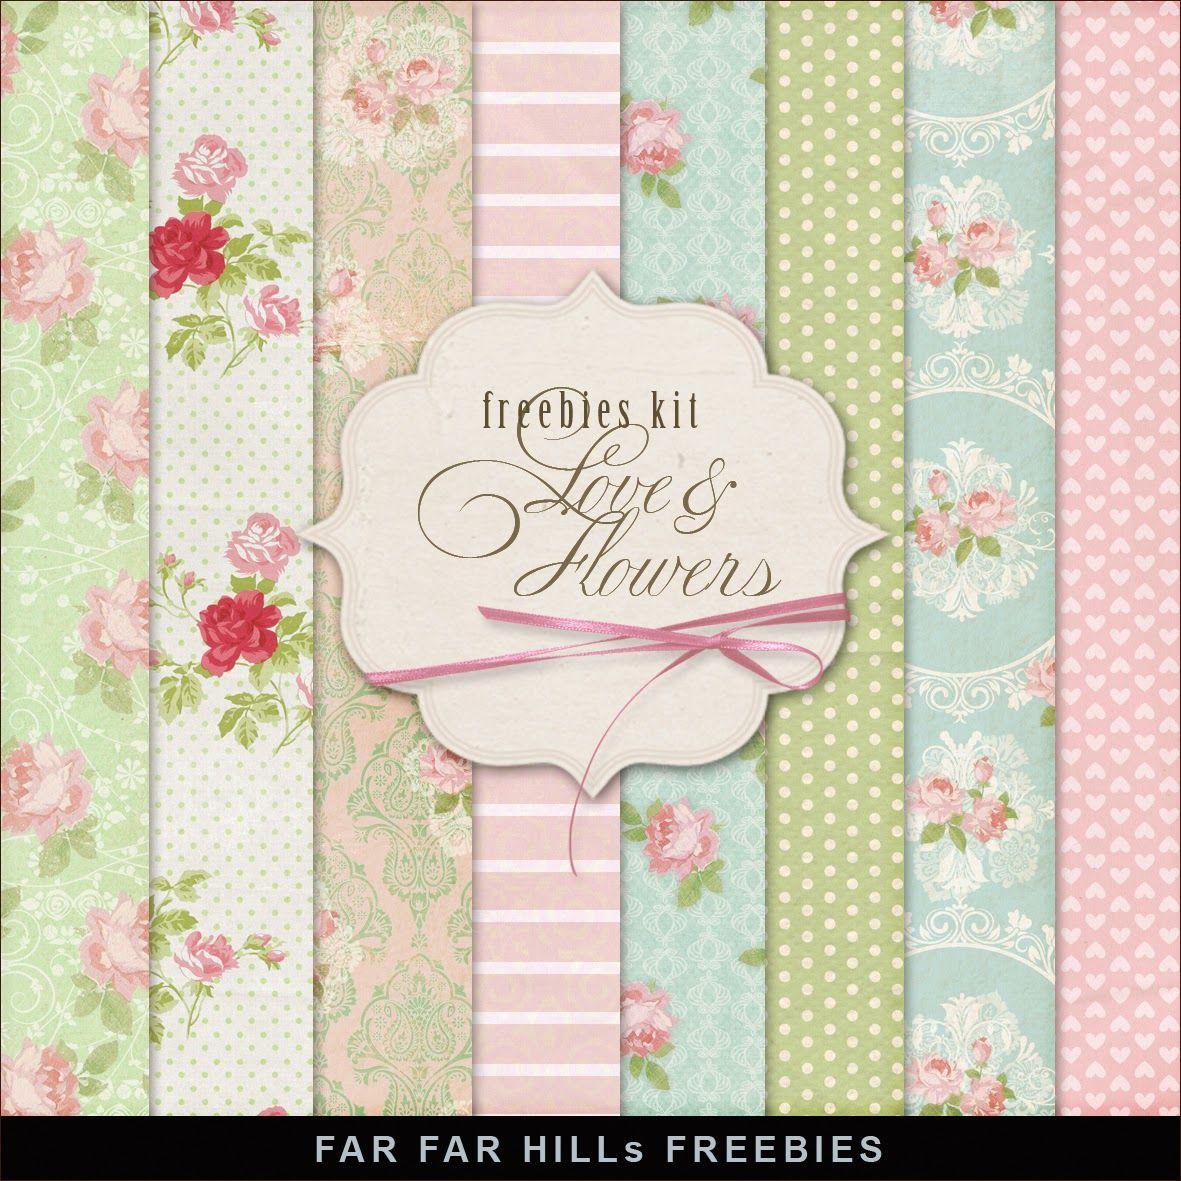 Far Far Hill: New Freebies Kit of Backgrounds - Love & Flowers